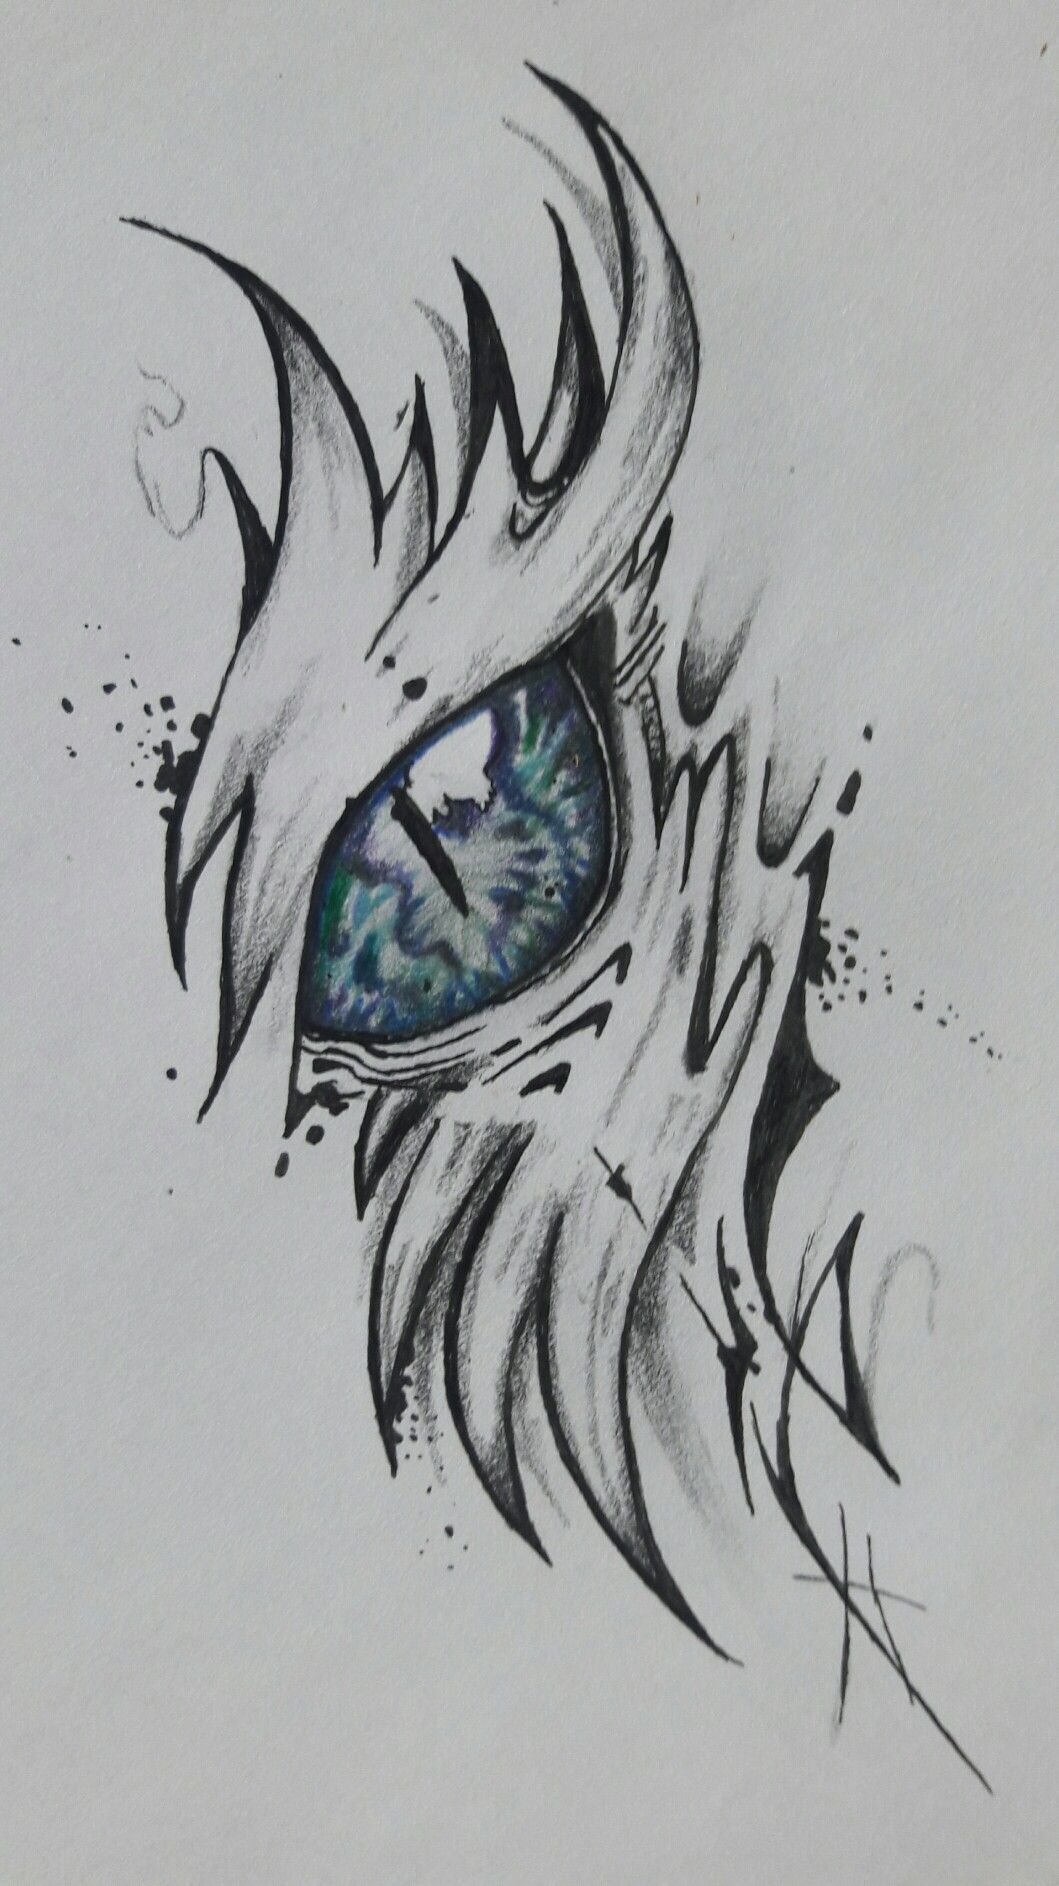 Me quedó lindo 3 Dragon eye drawing, Dragon sketch